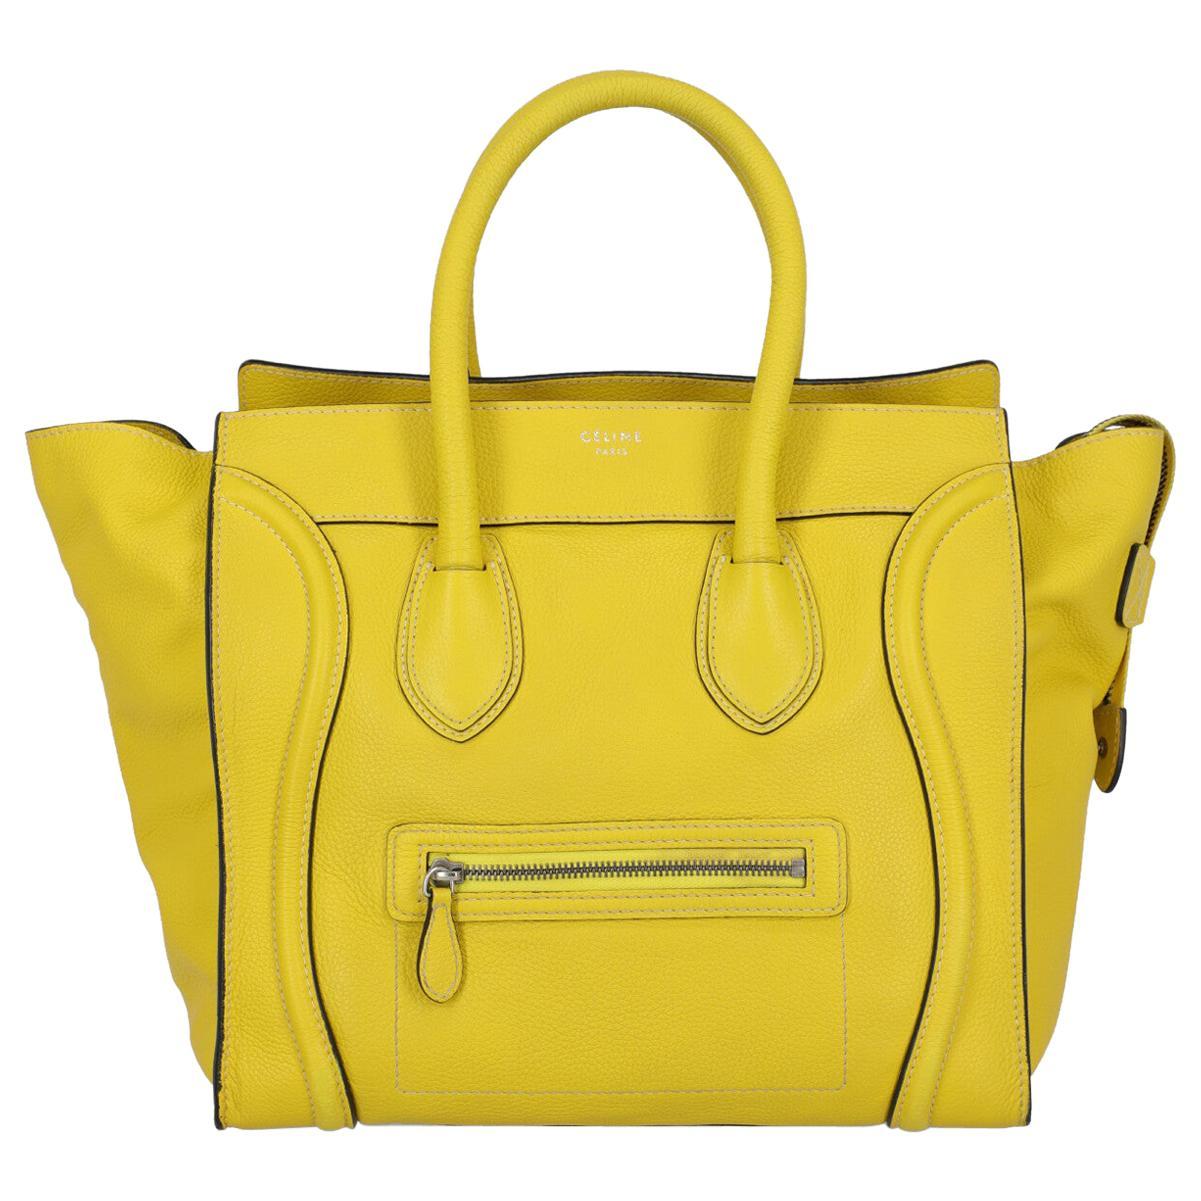 Celine Women's Luggage Yellow Leather